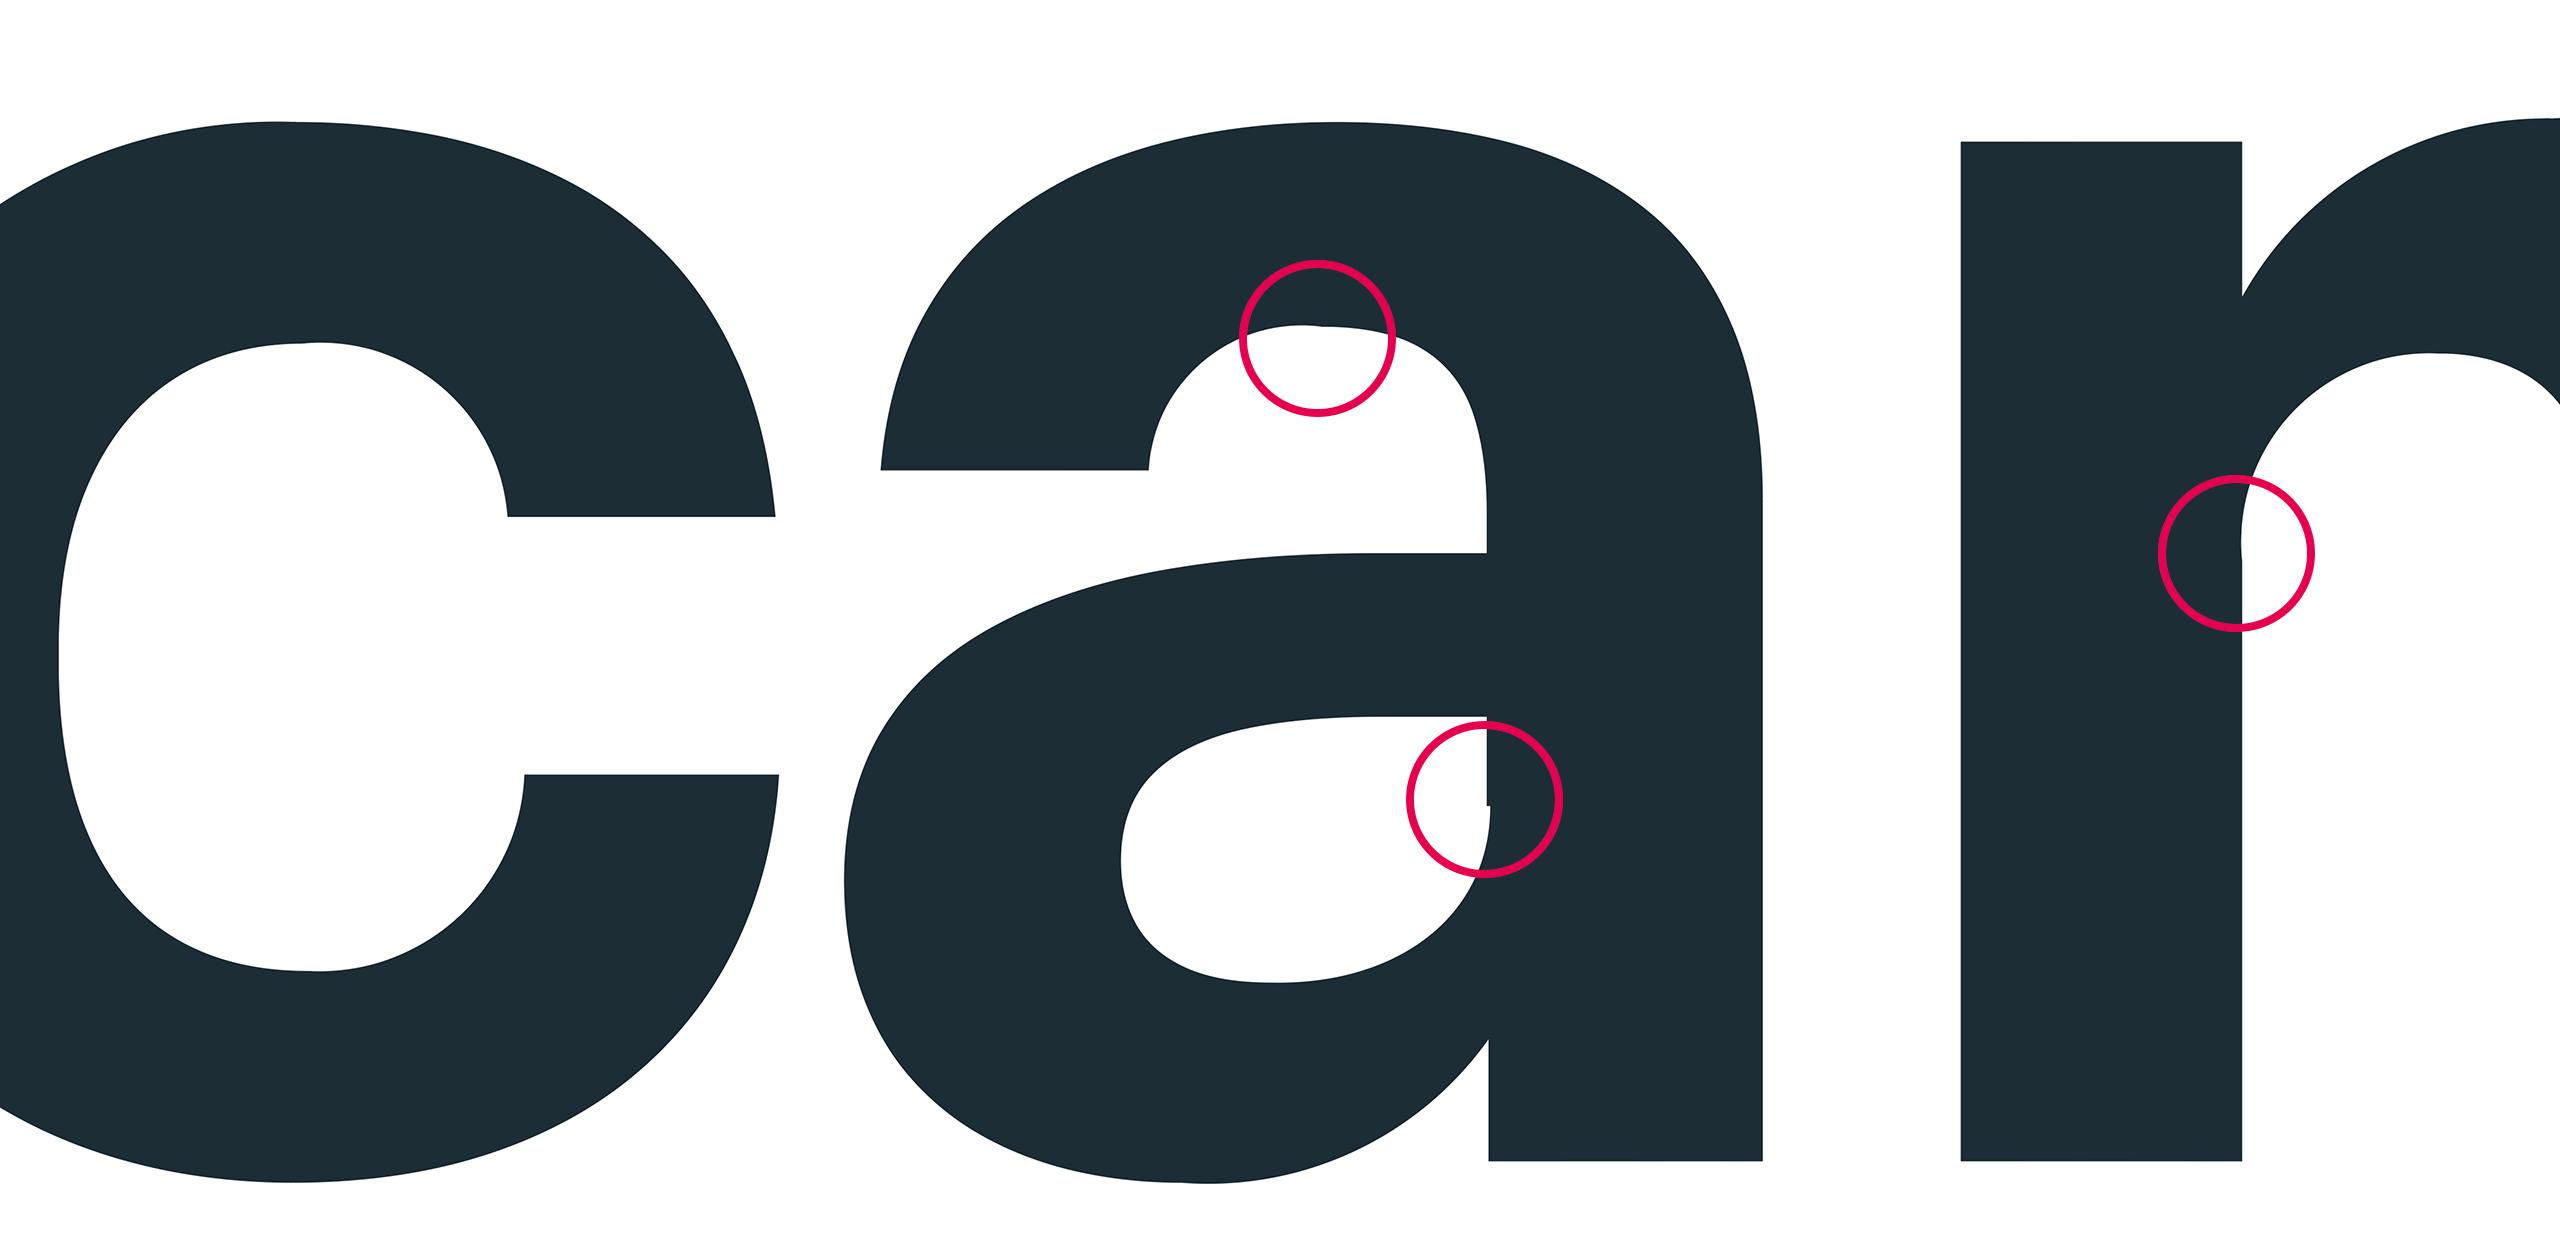 Basecam wordmark errors